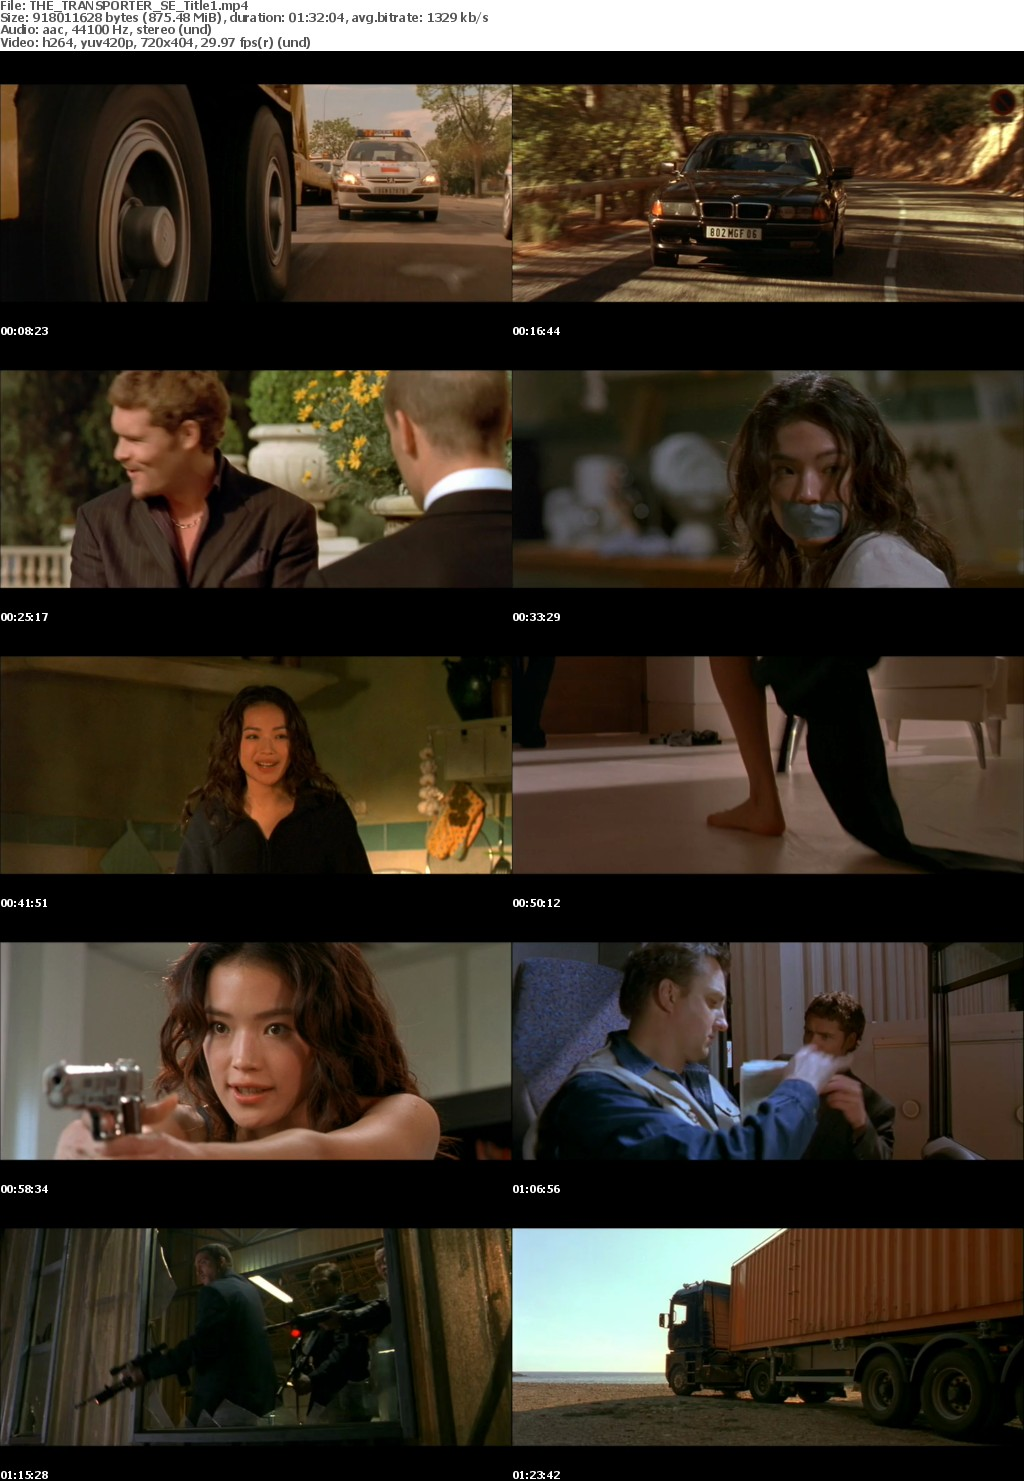 The Transporter (2002)Mp-4 X264 Dvd-Rip 480p AACDSD